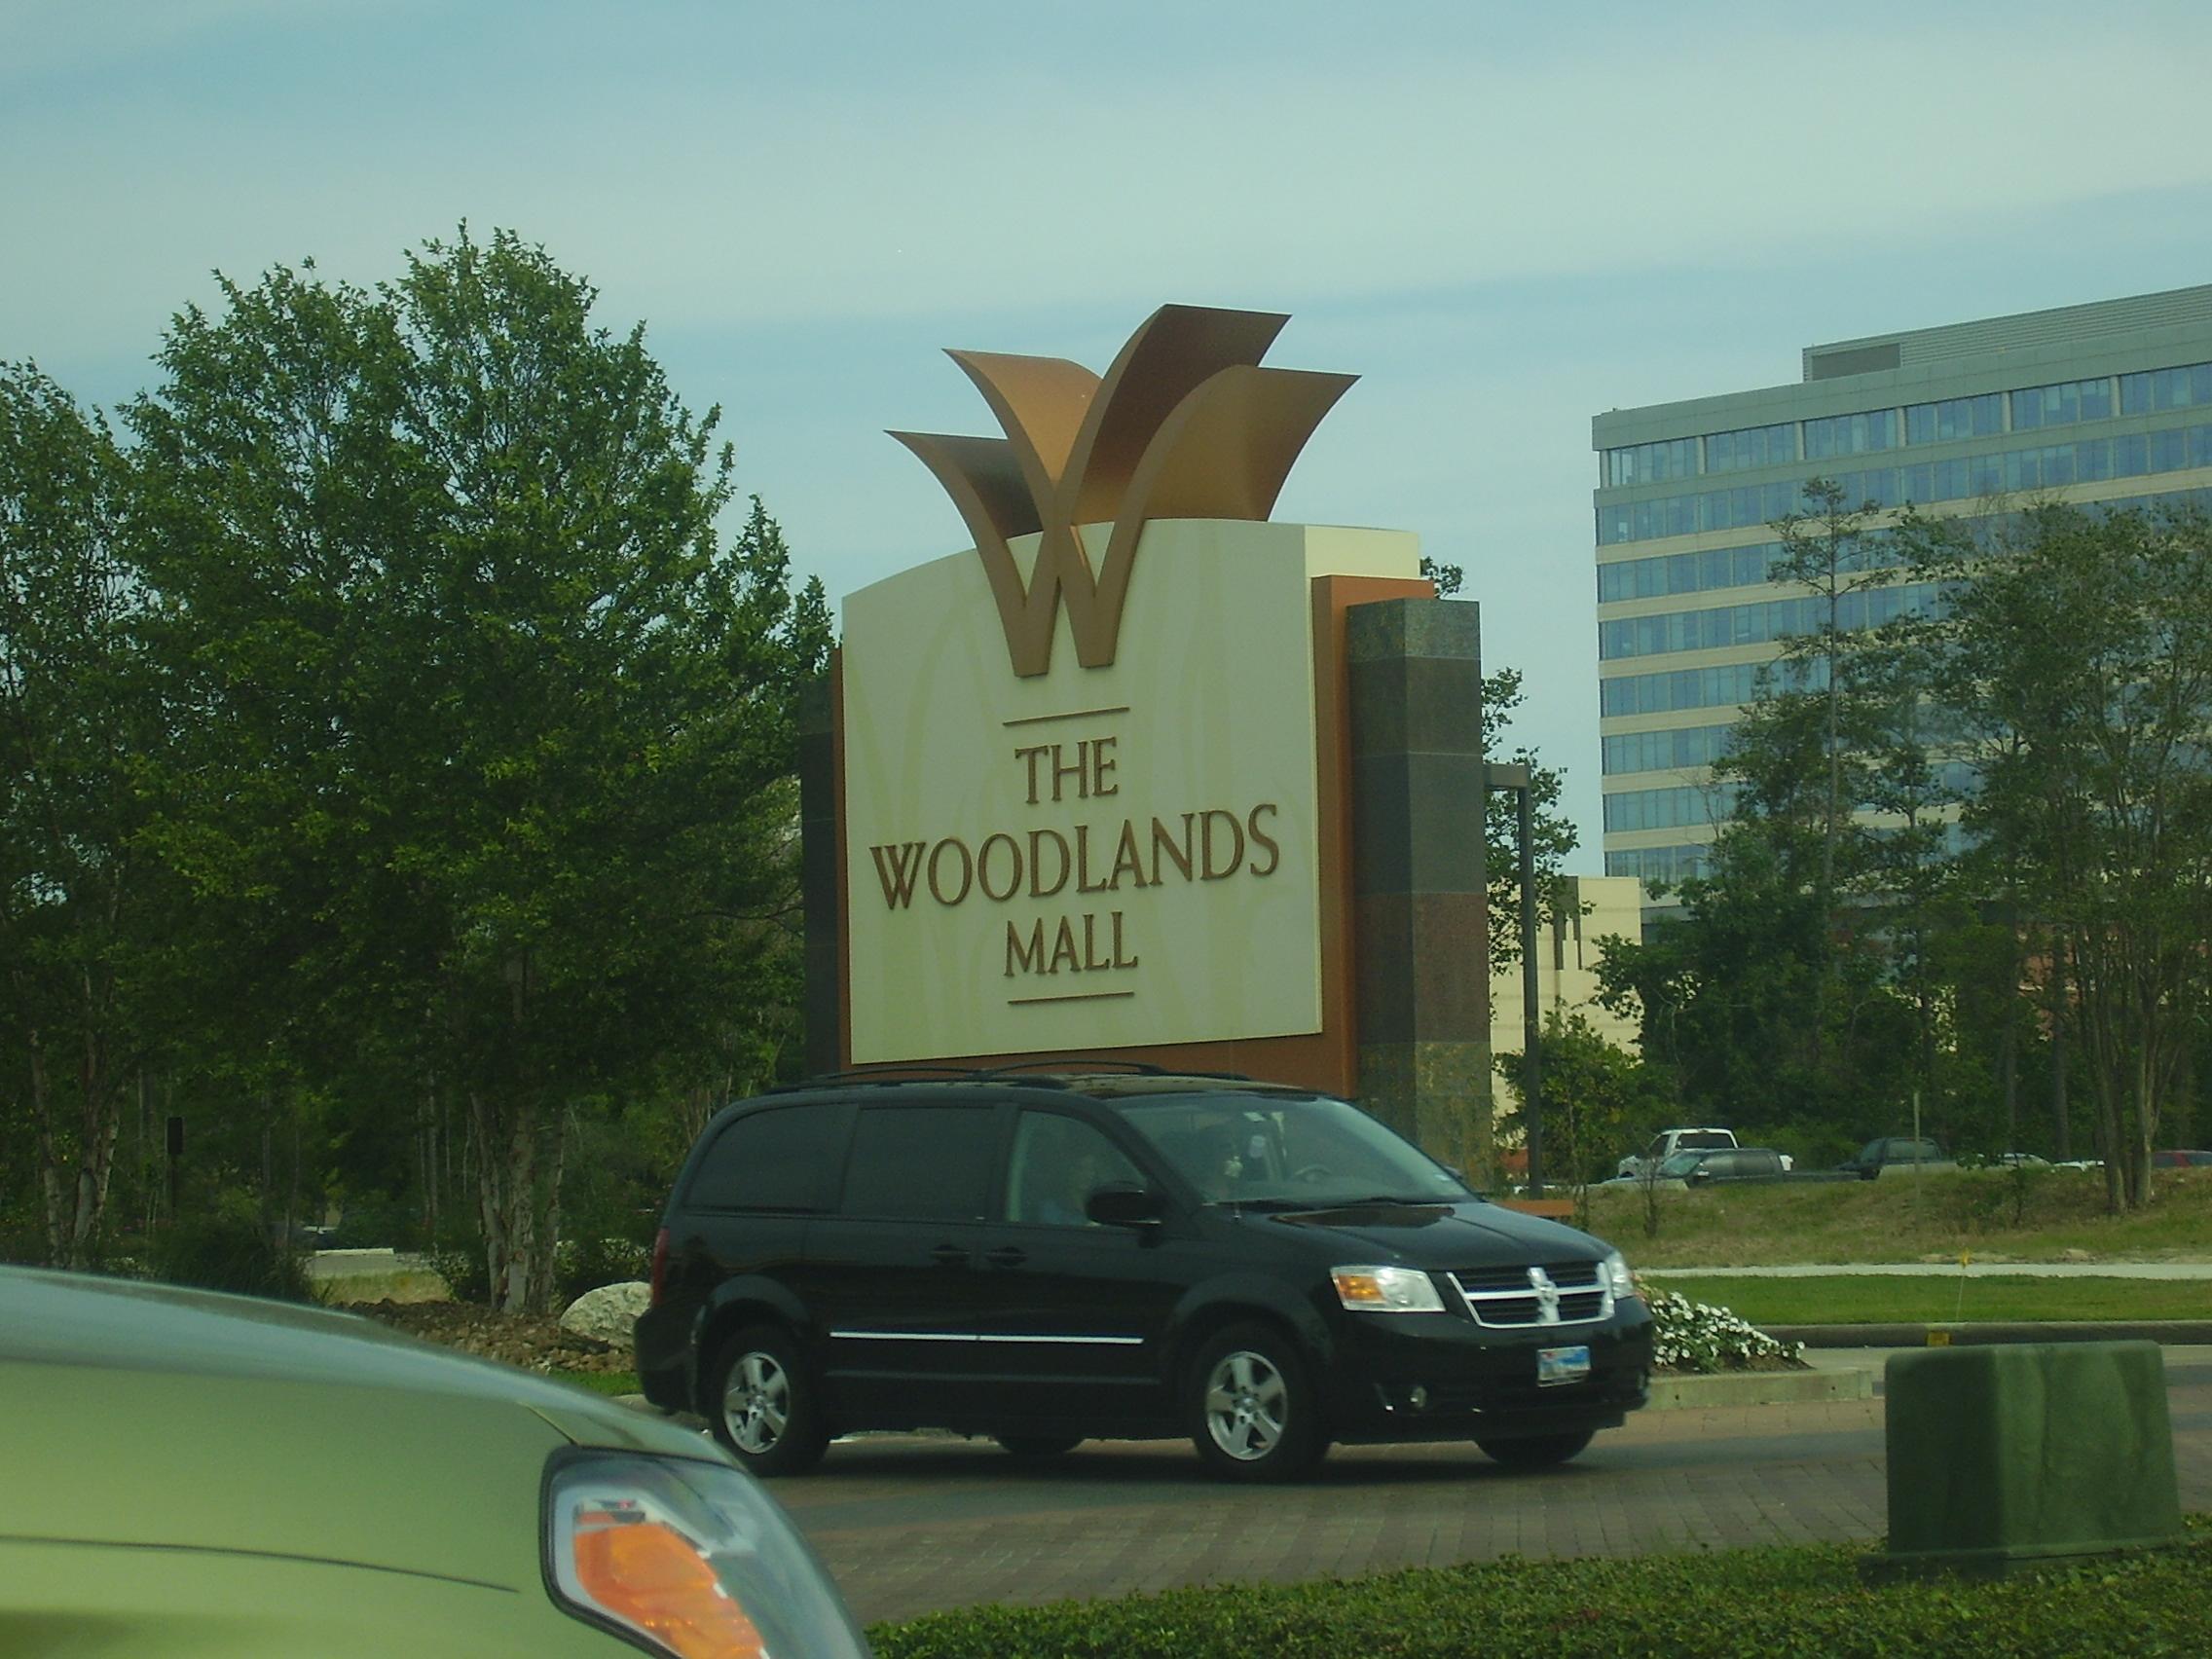 The Woodlands Mall - Wikipedia